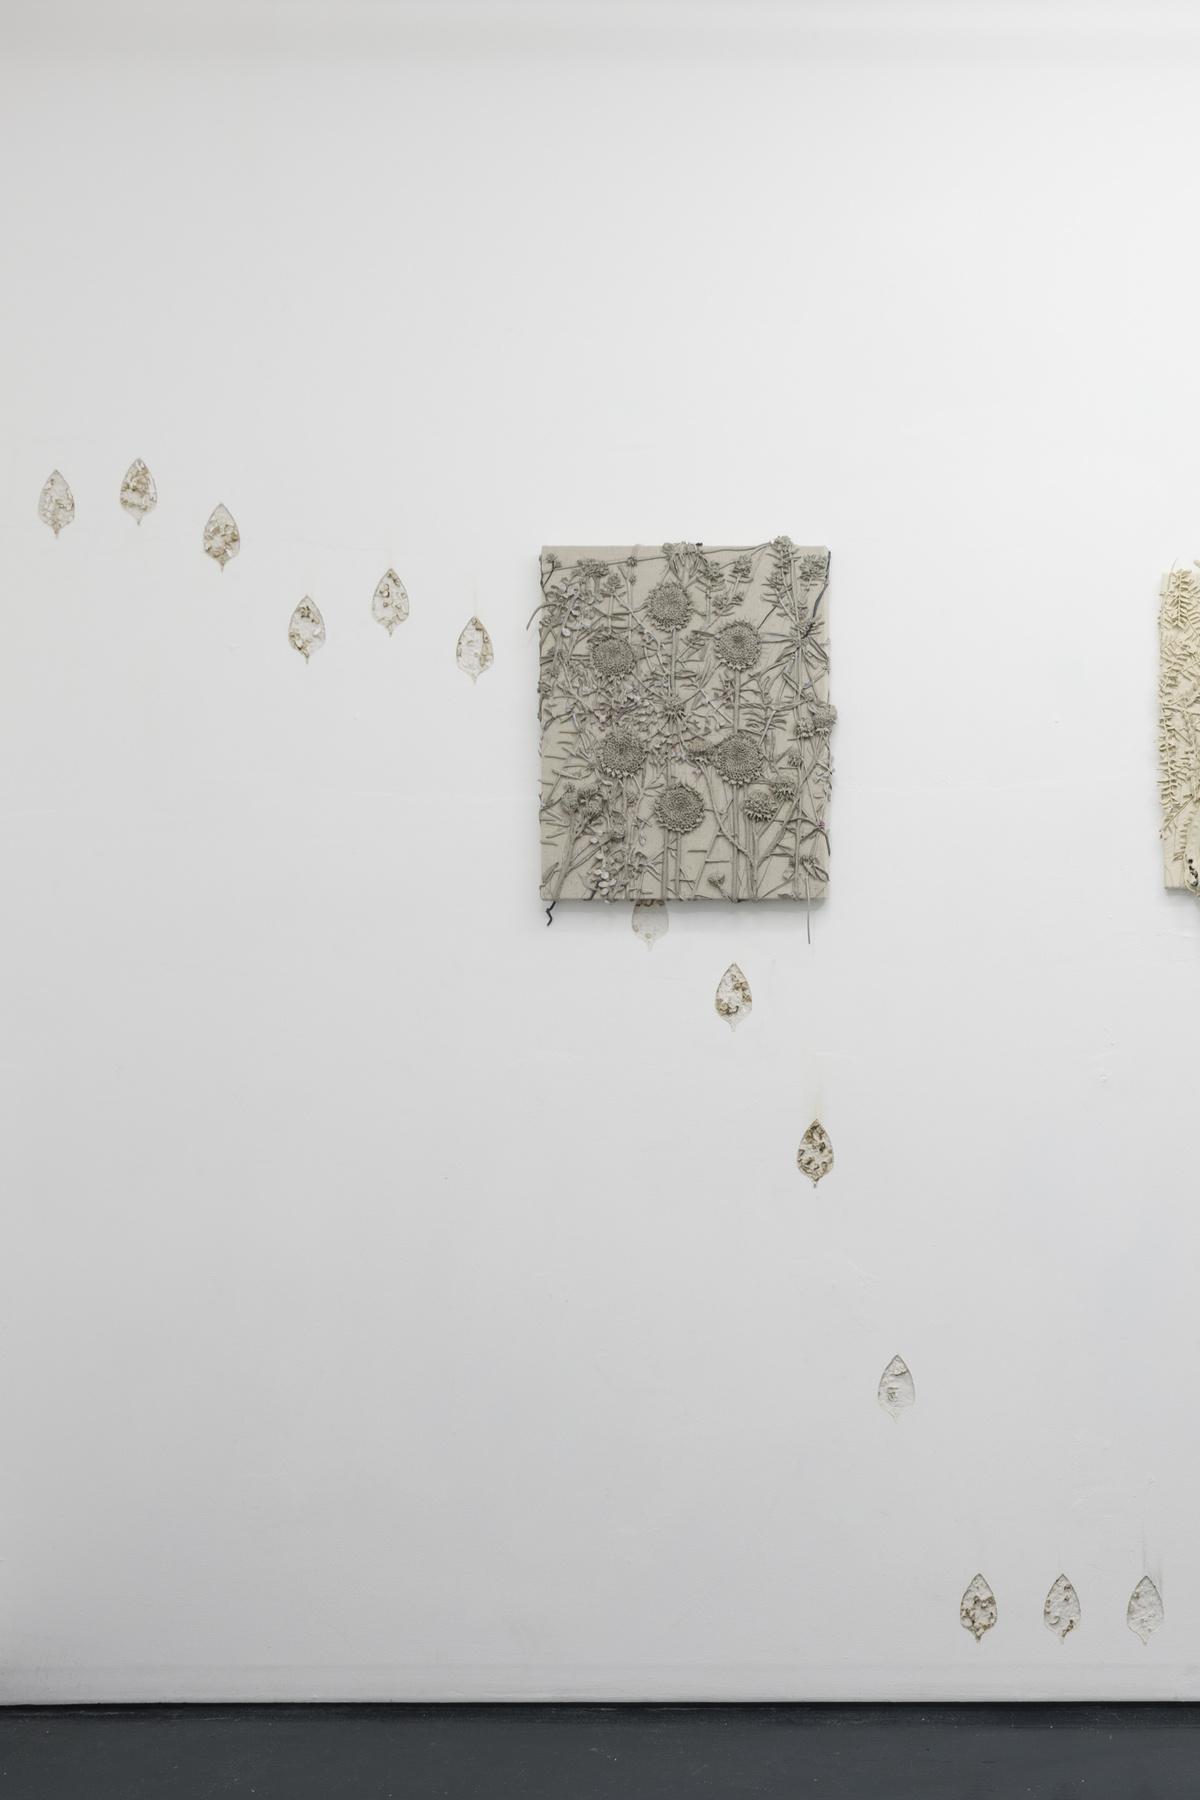 Michael Assiff-Ozone Flowers 7